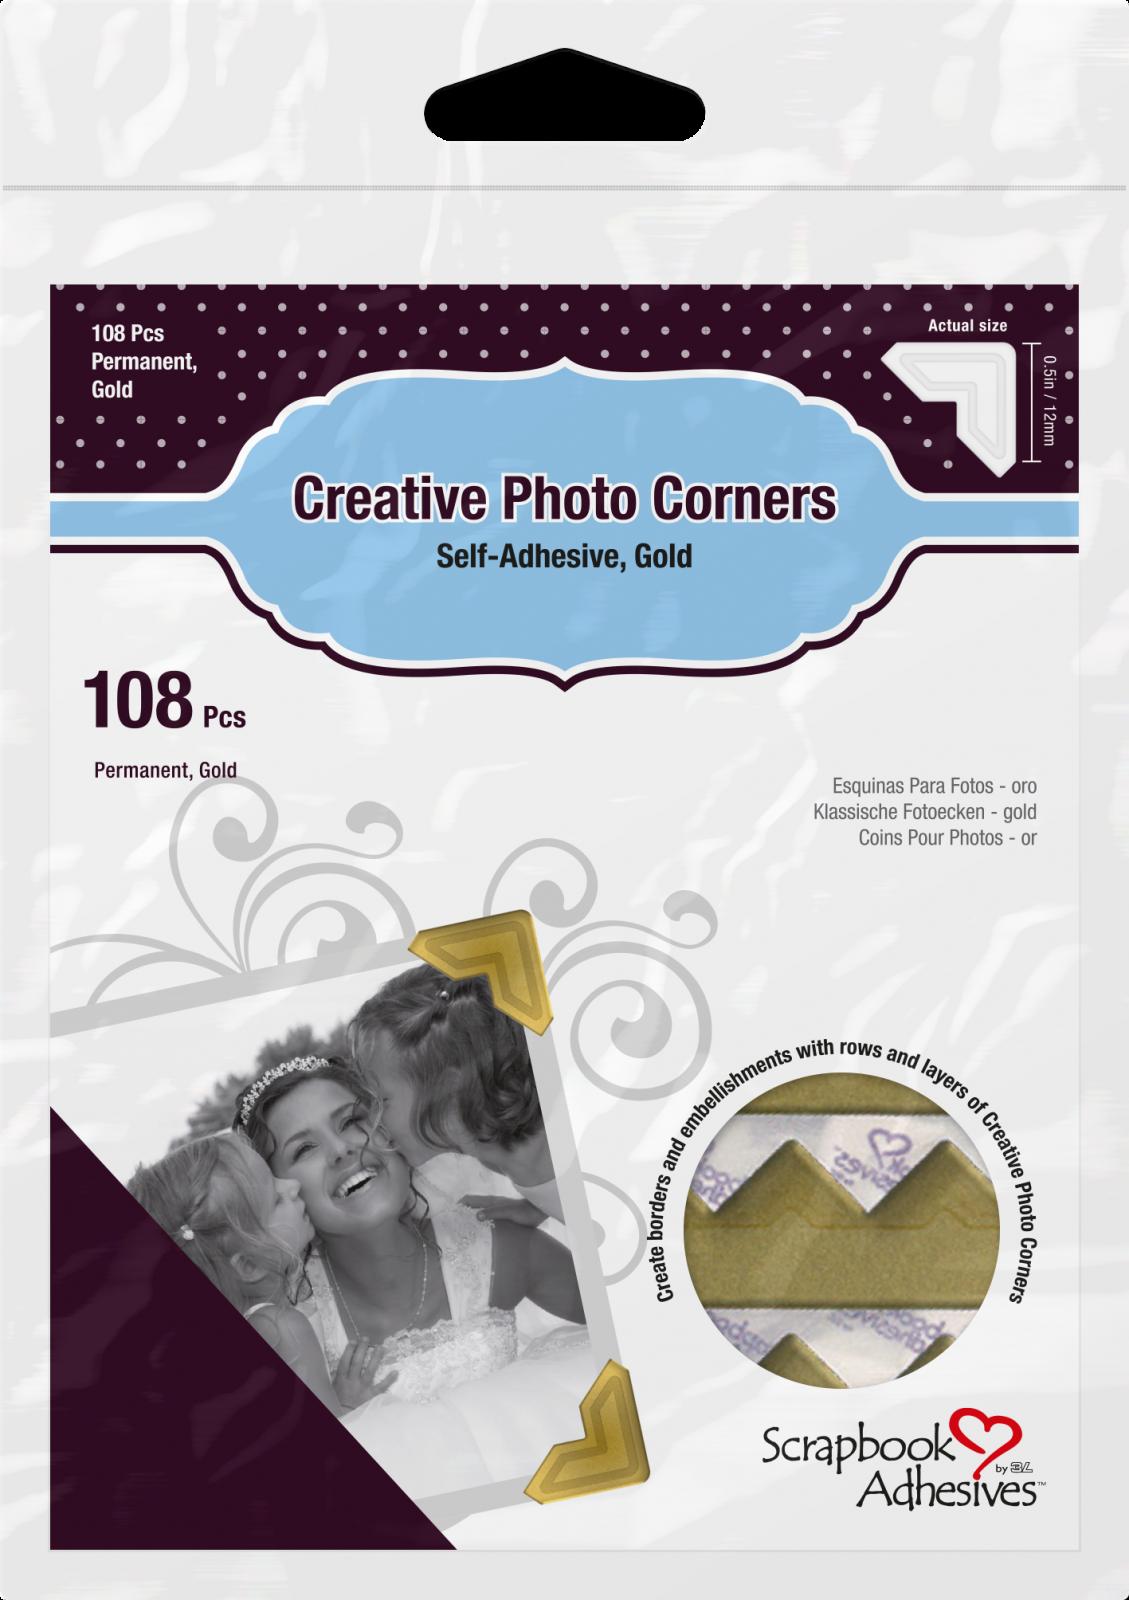 ^Scrapbook Adhesives - Creative Photo Corners Gold 108 Pcs